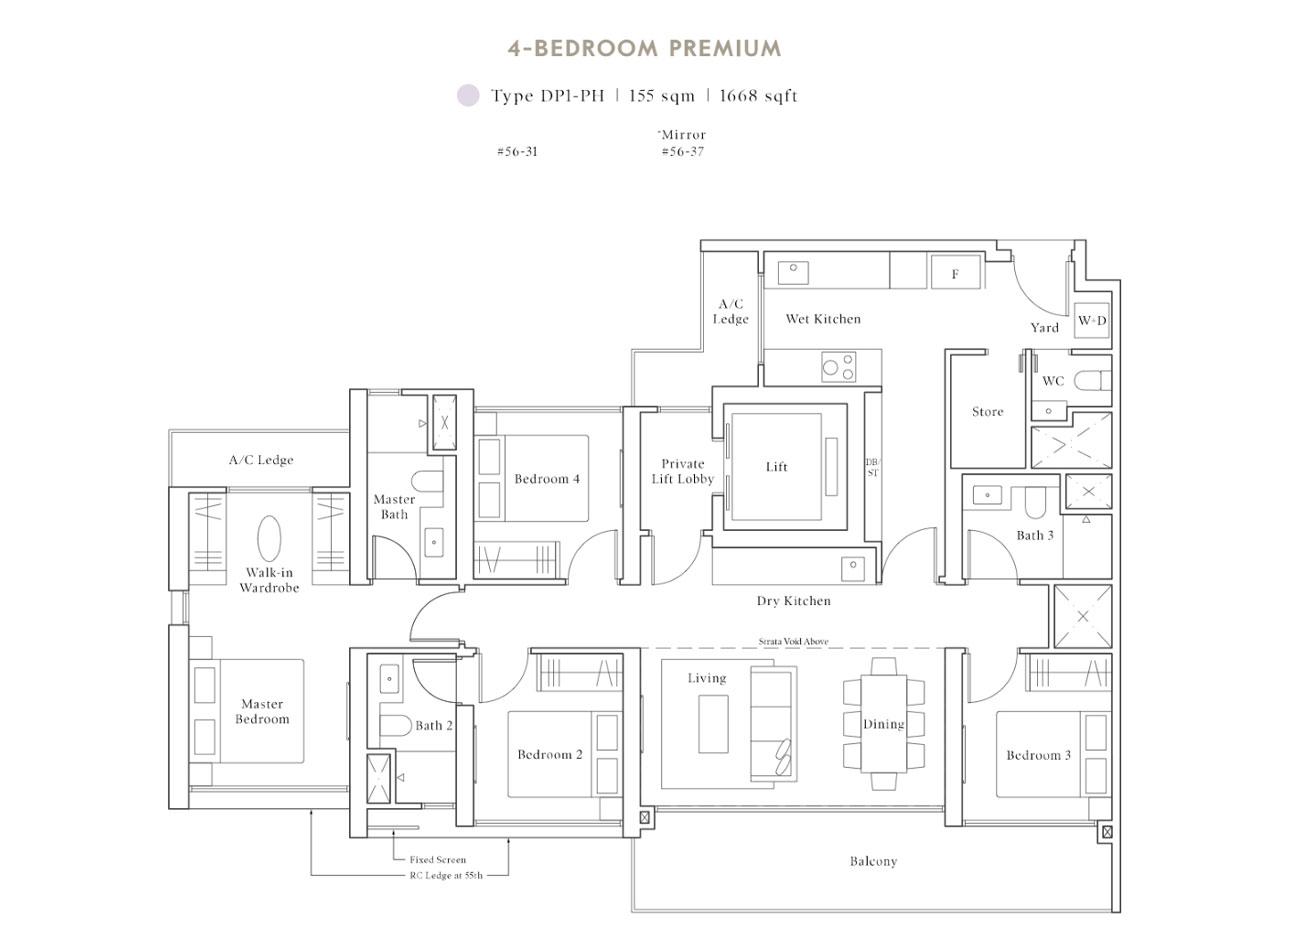 Peak PH Collection - 4 Bedroom Premium, DP1-PH